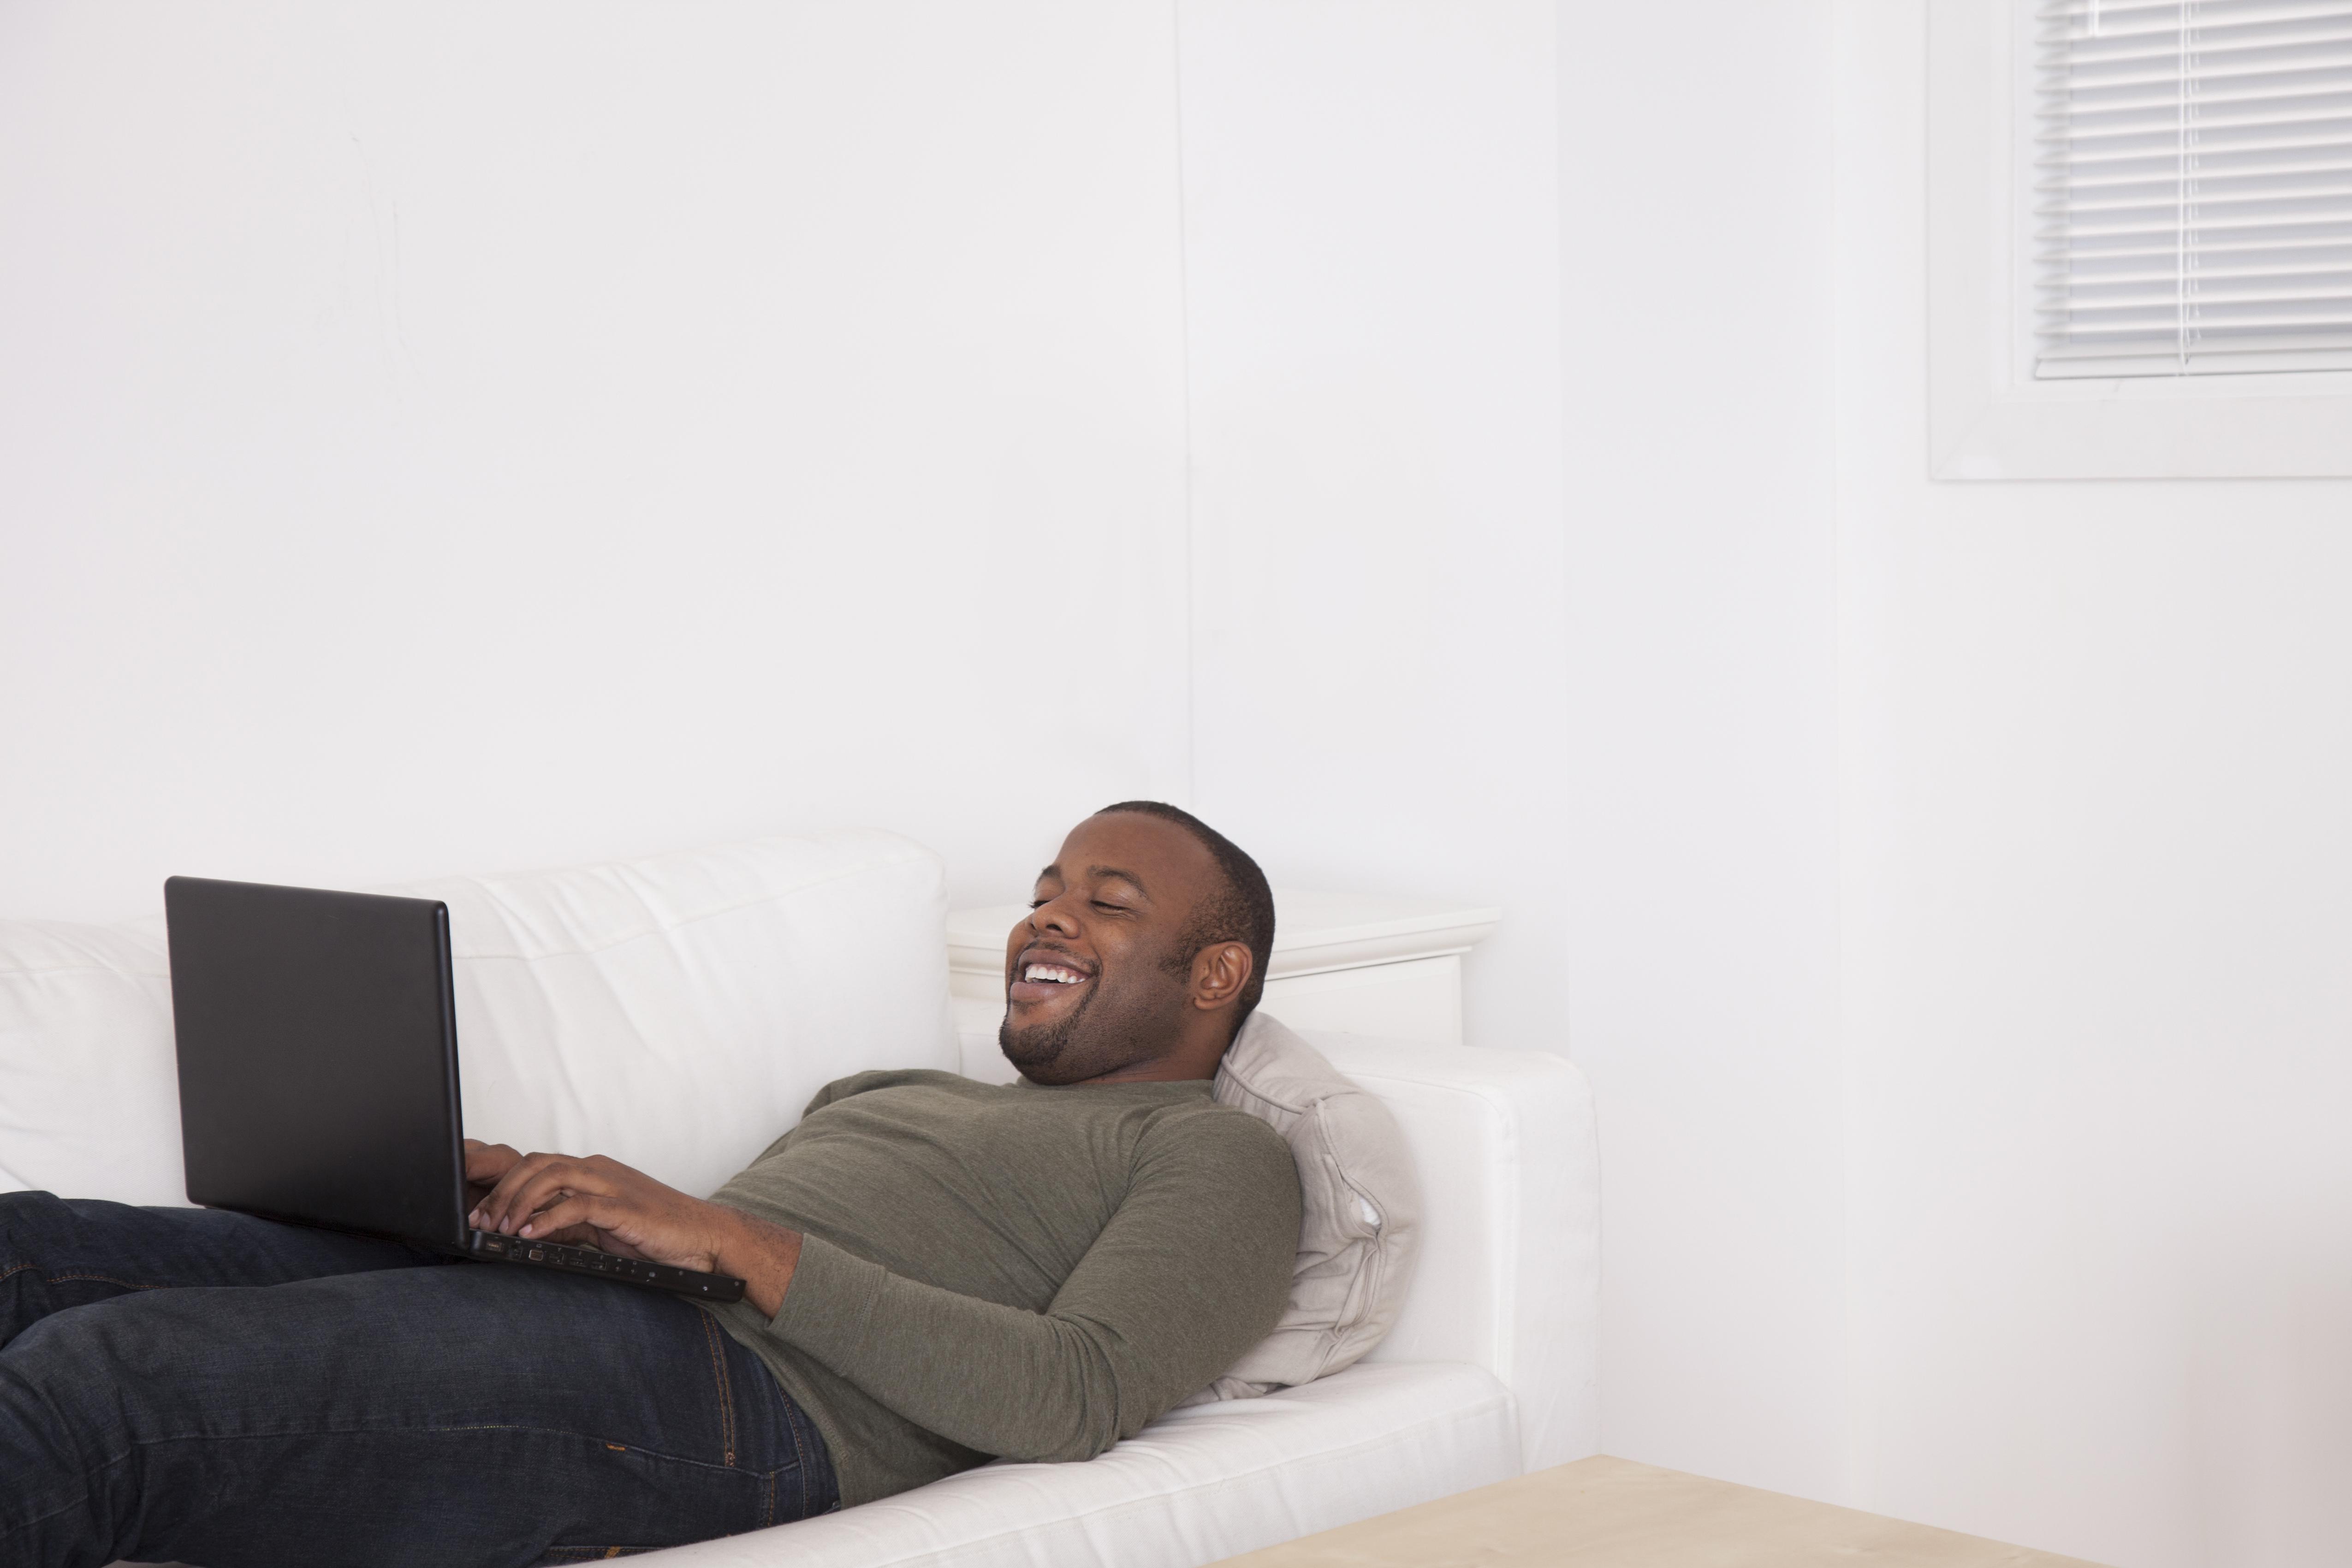 Black man laying on sofa using digital tablet